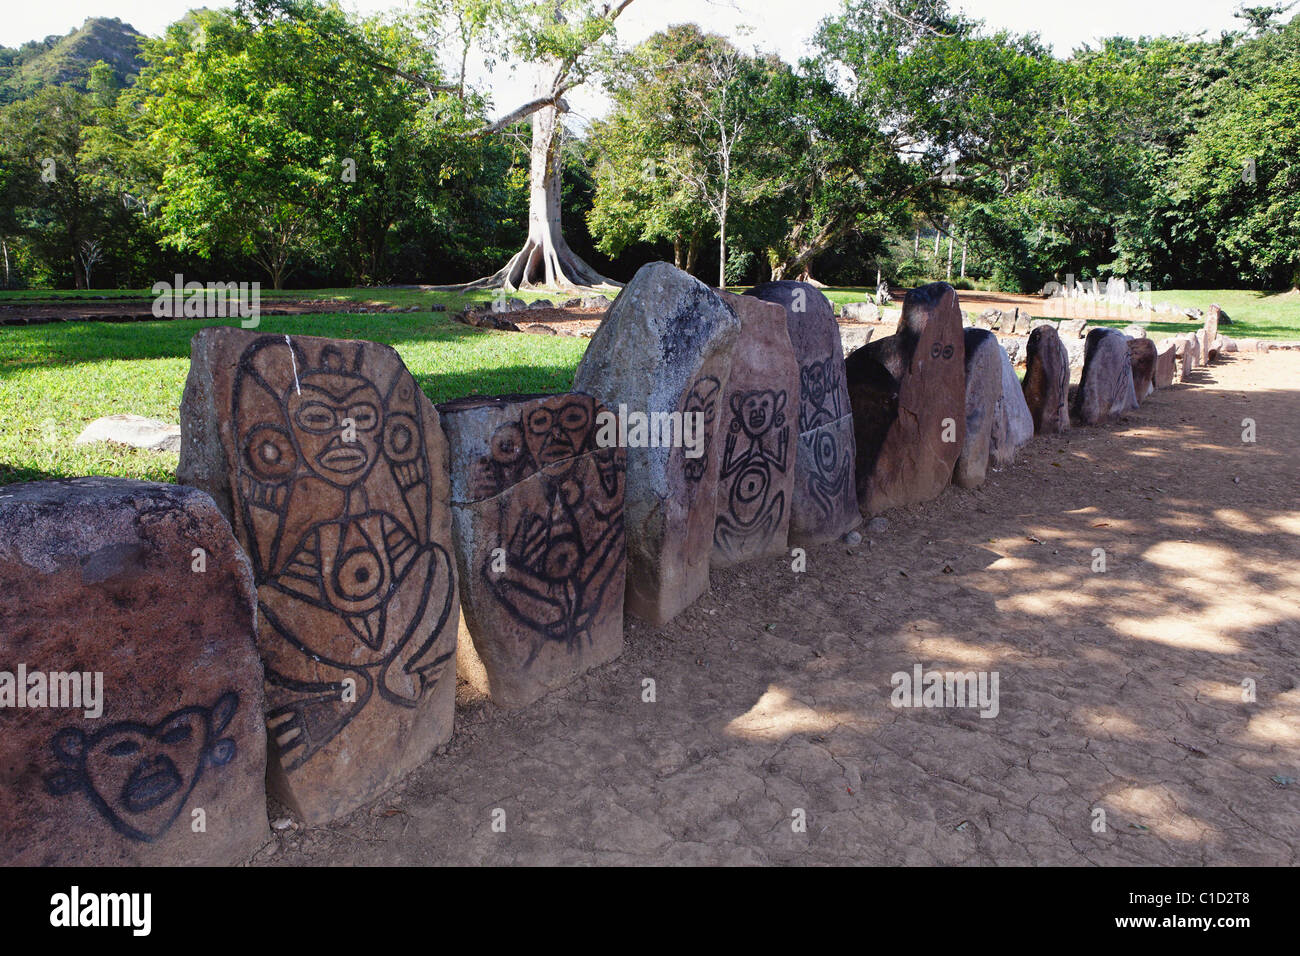 Petroglyph at the Caguana Ceremonial Park, Utuado, Puerto Rico - Stock Image